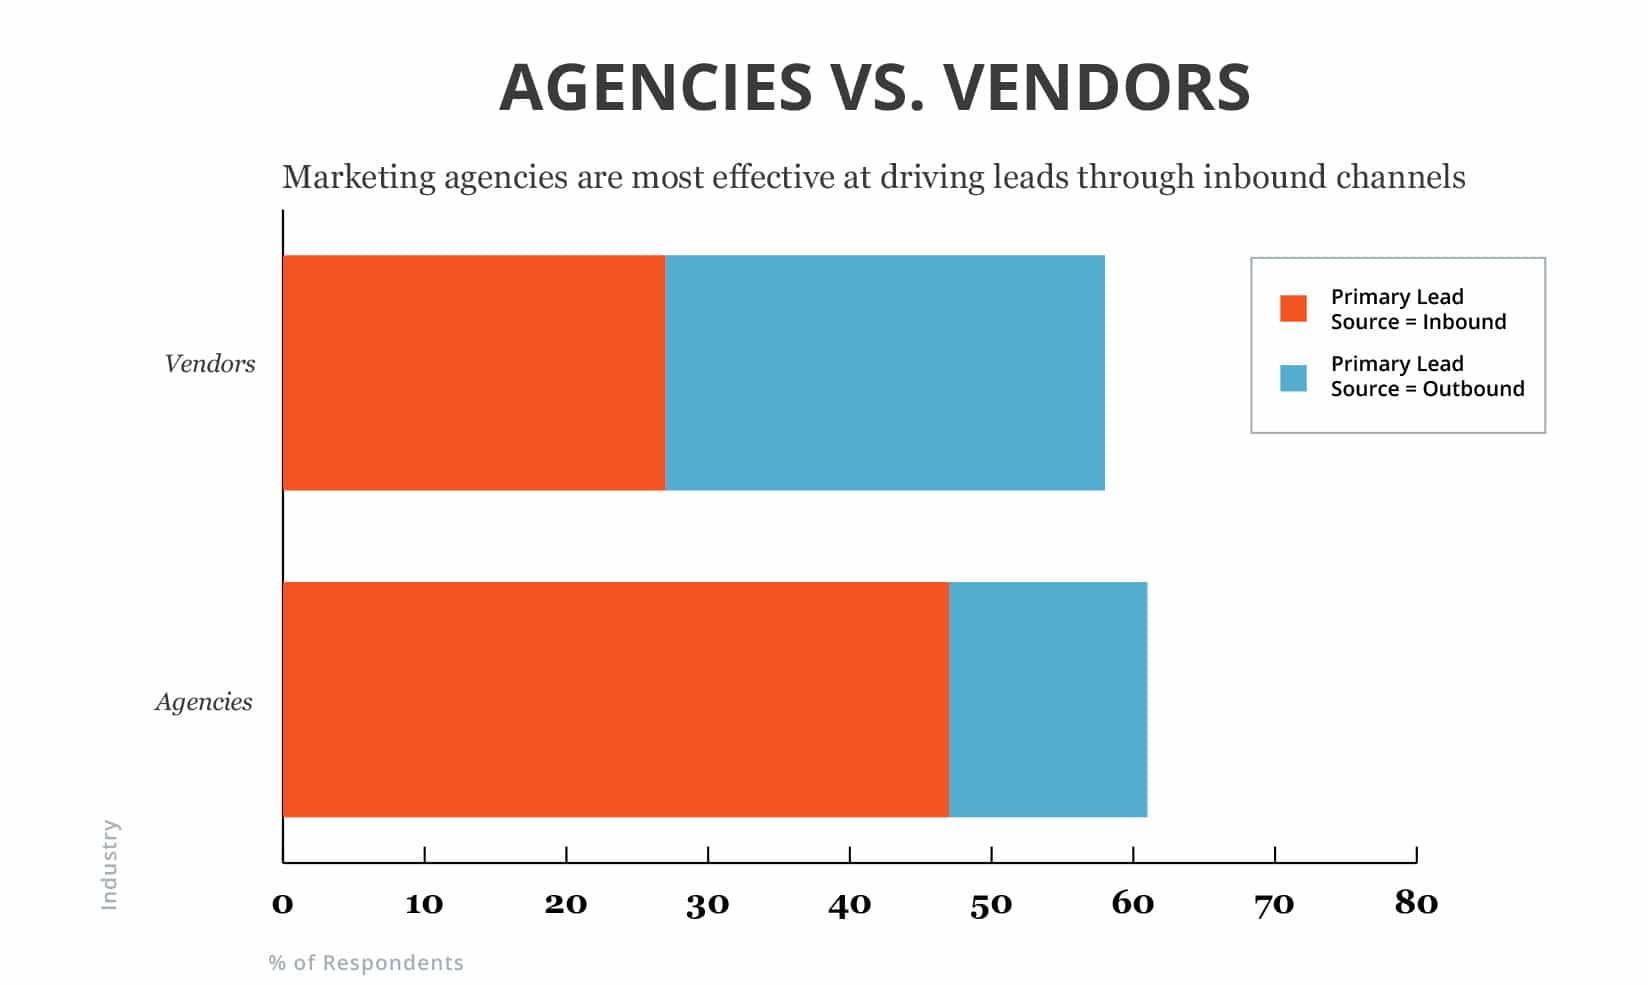 Agencies vs Vendors On Inbound Marketing Leads